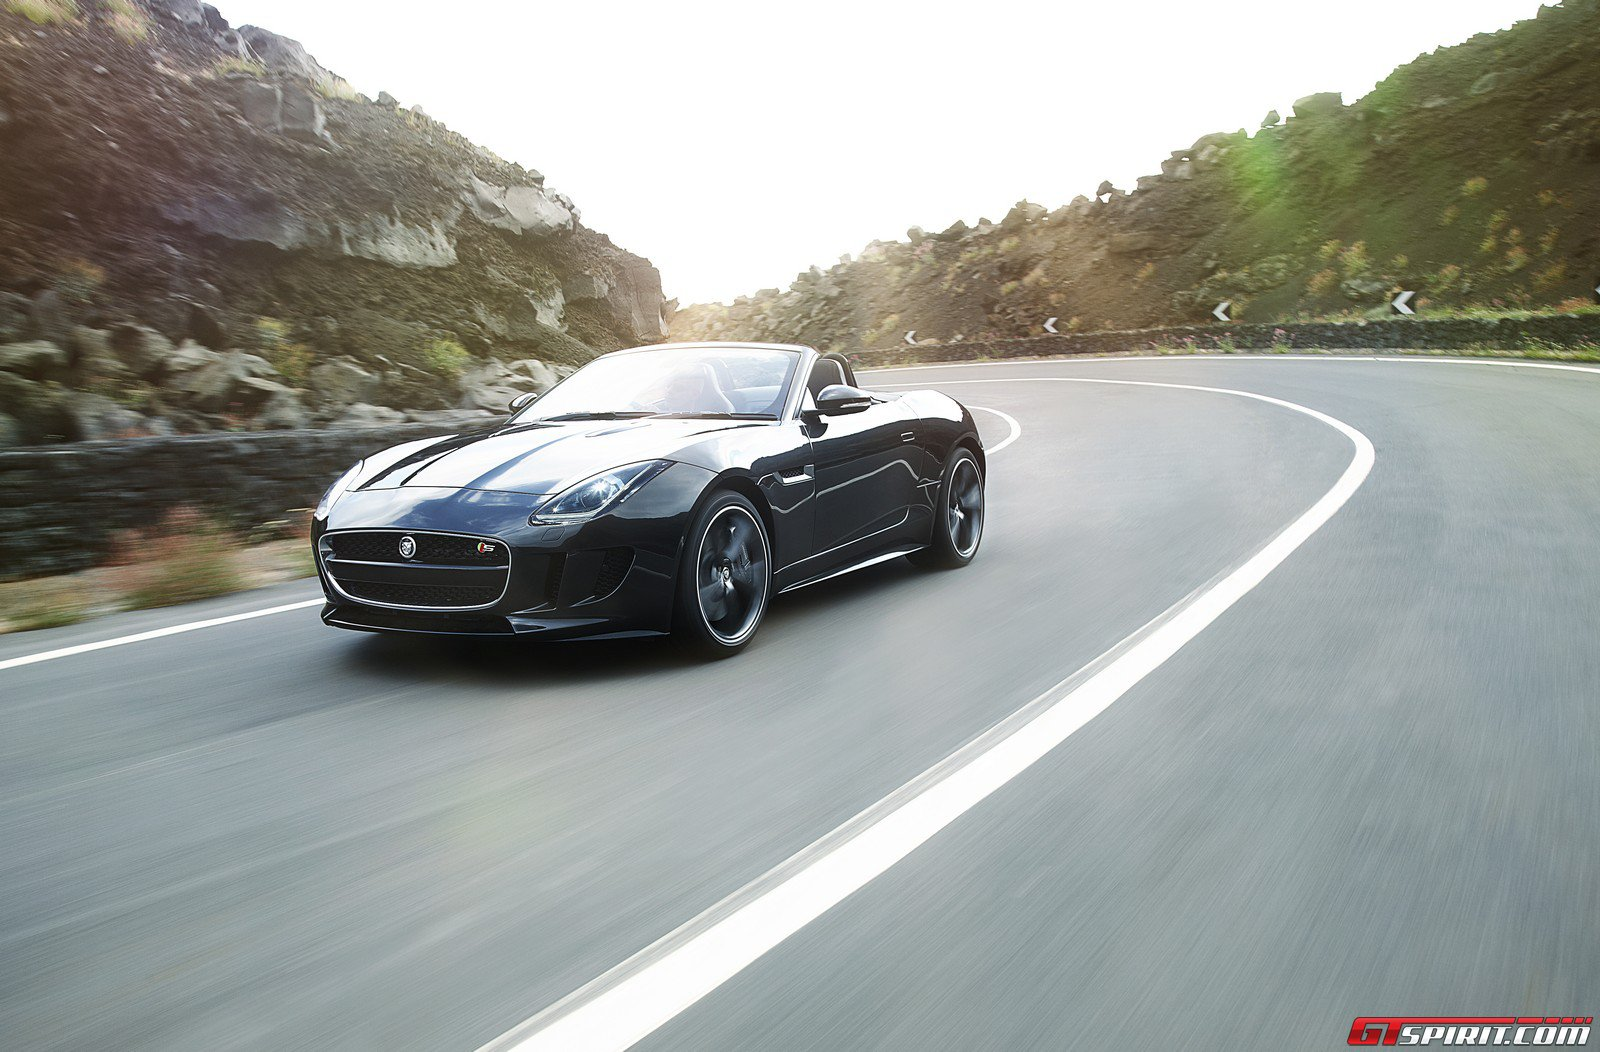 Jaguar F-Type - Exterior Photo 20